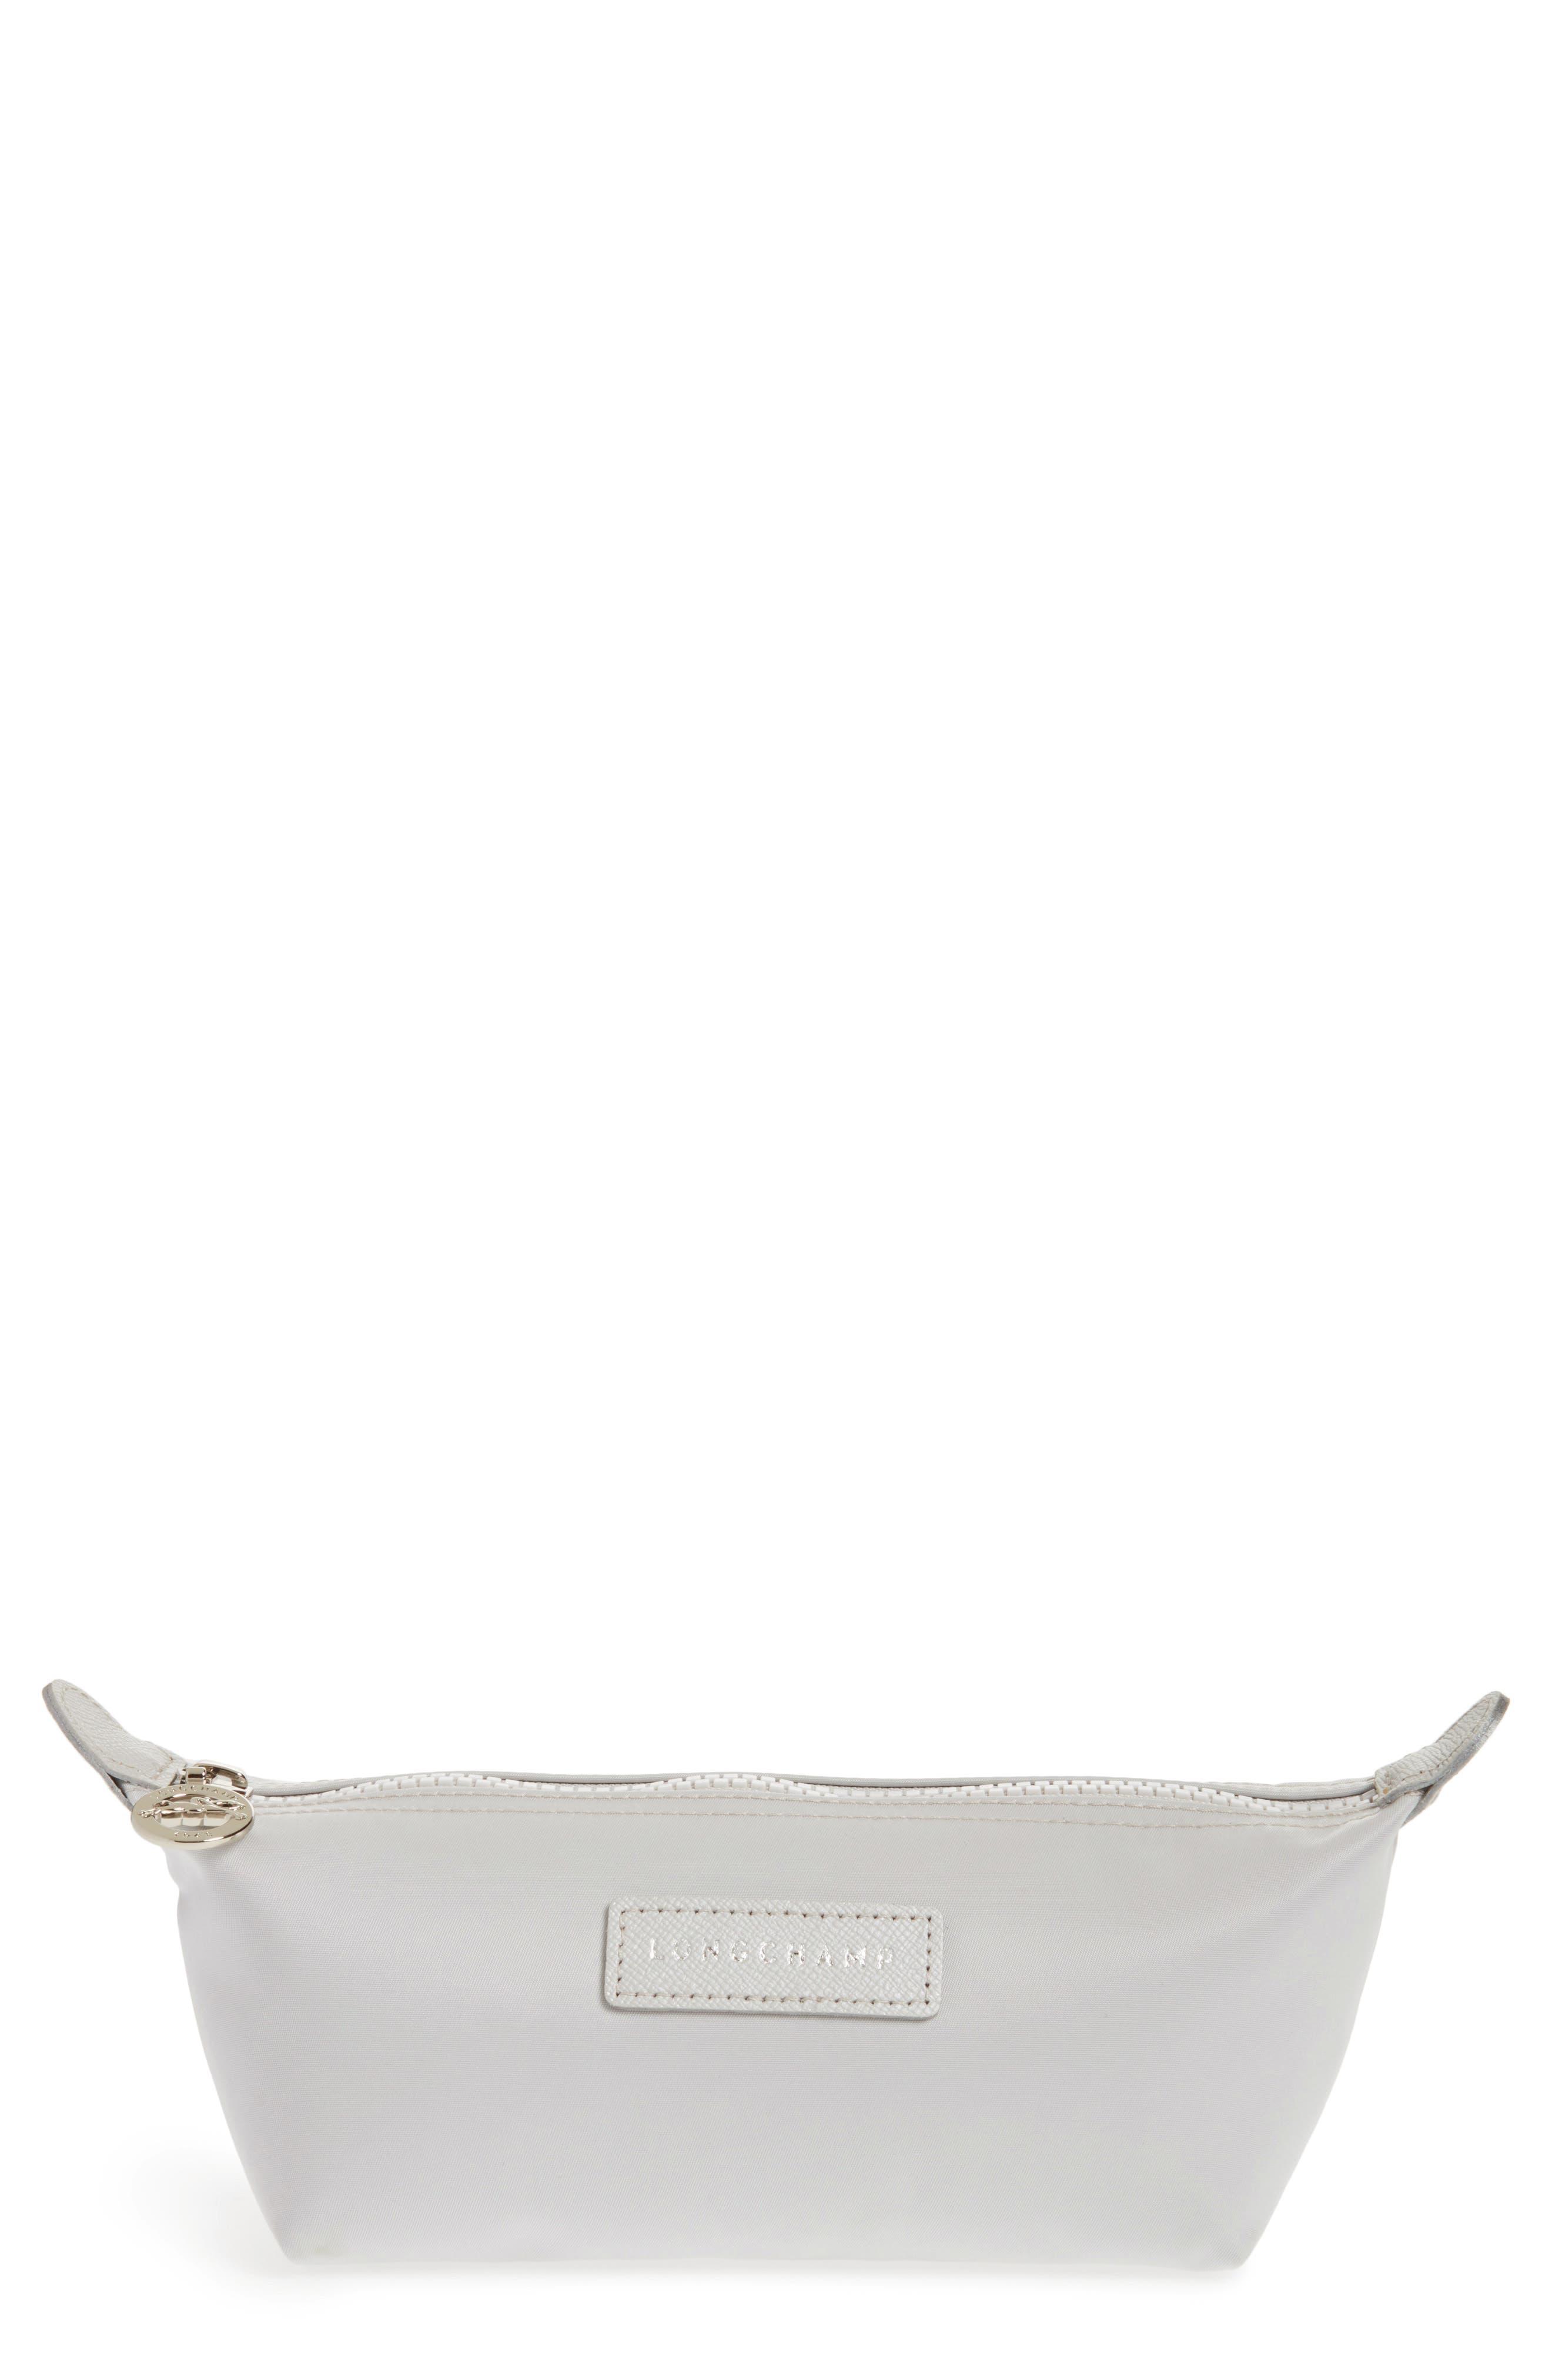 'Neo' Nylon Cosmetics Bag, Silver